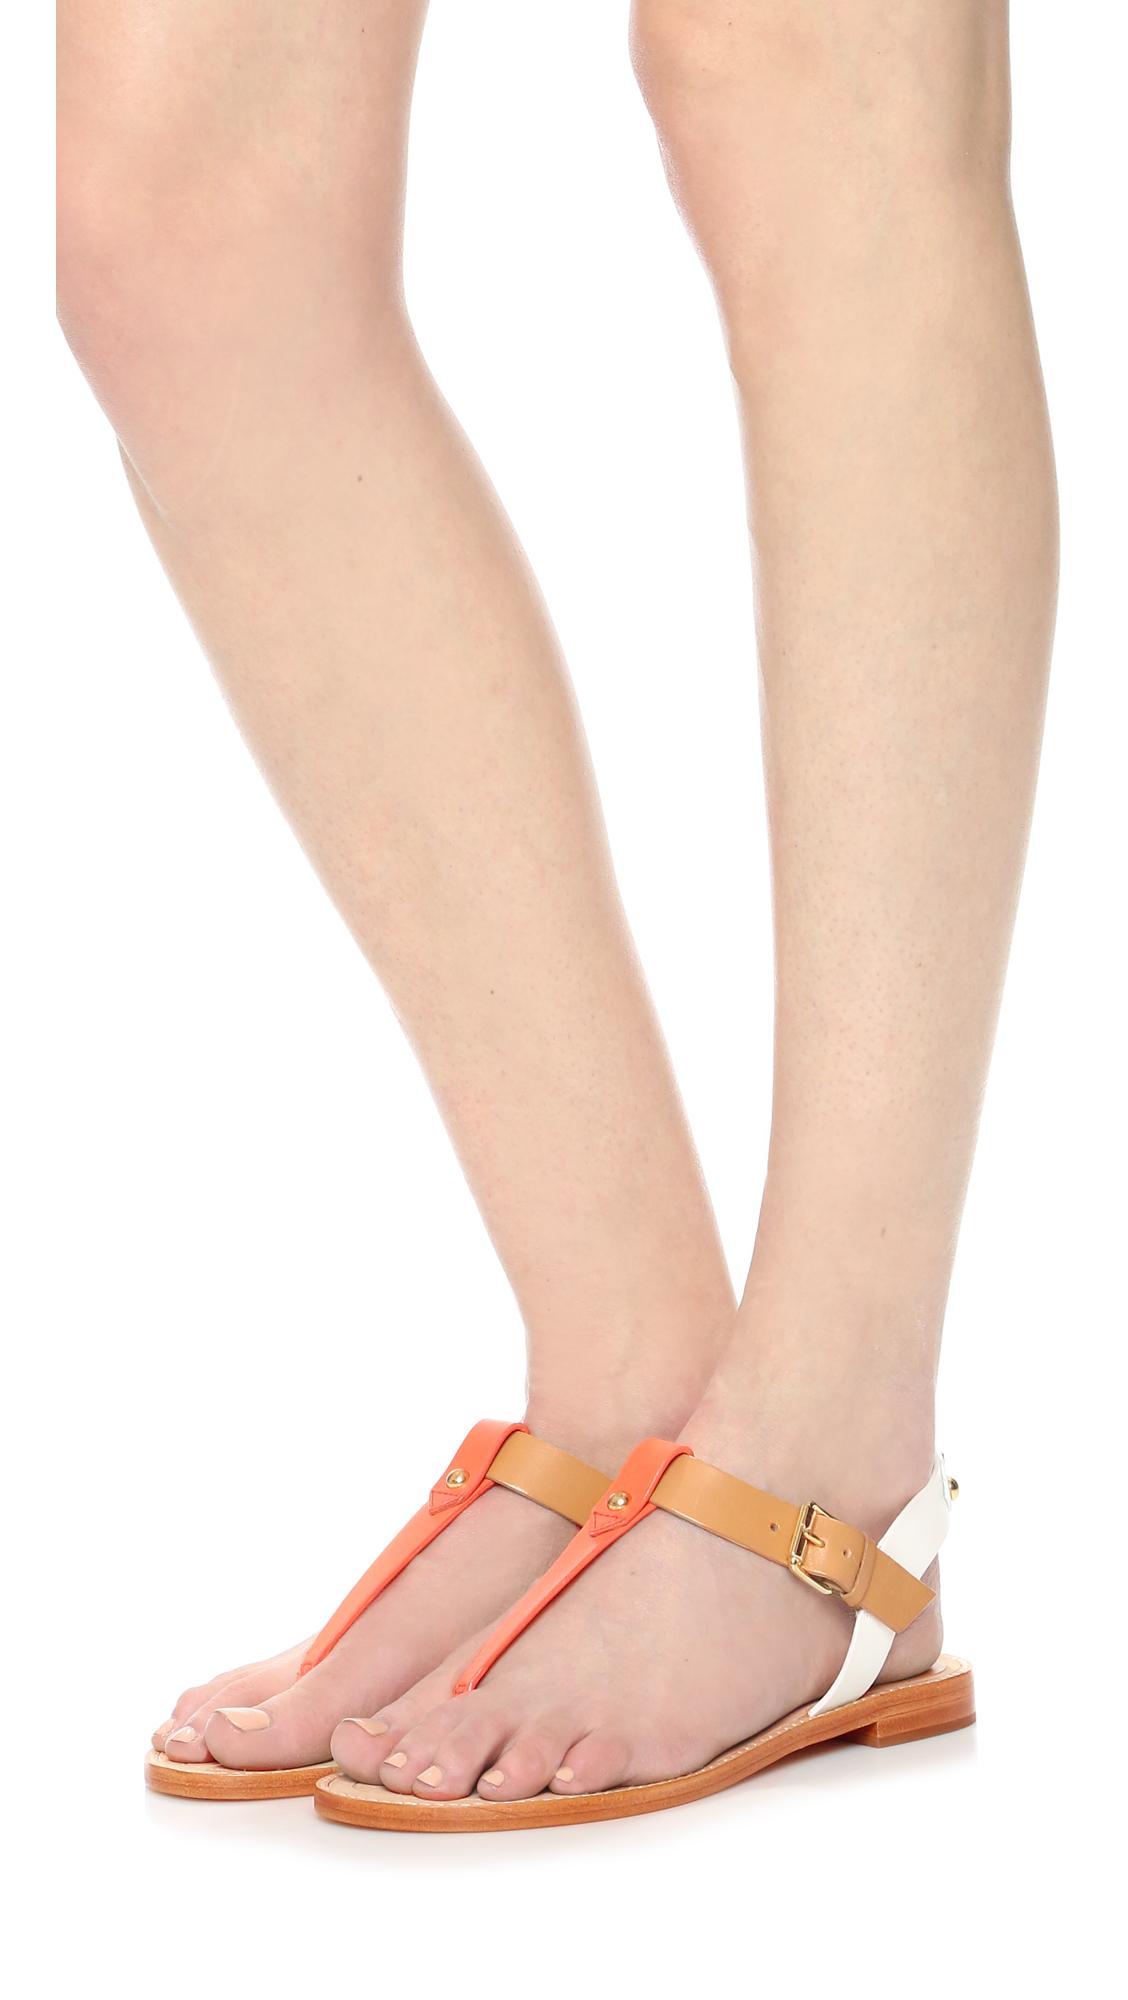 d72851619b2b Lyst - Kate Spade Sky Thong Sandals in Orange